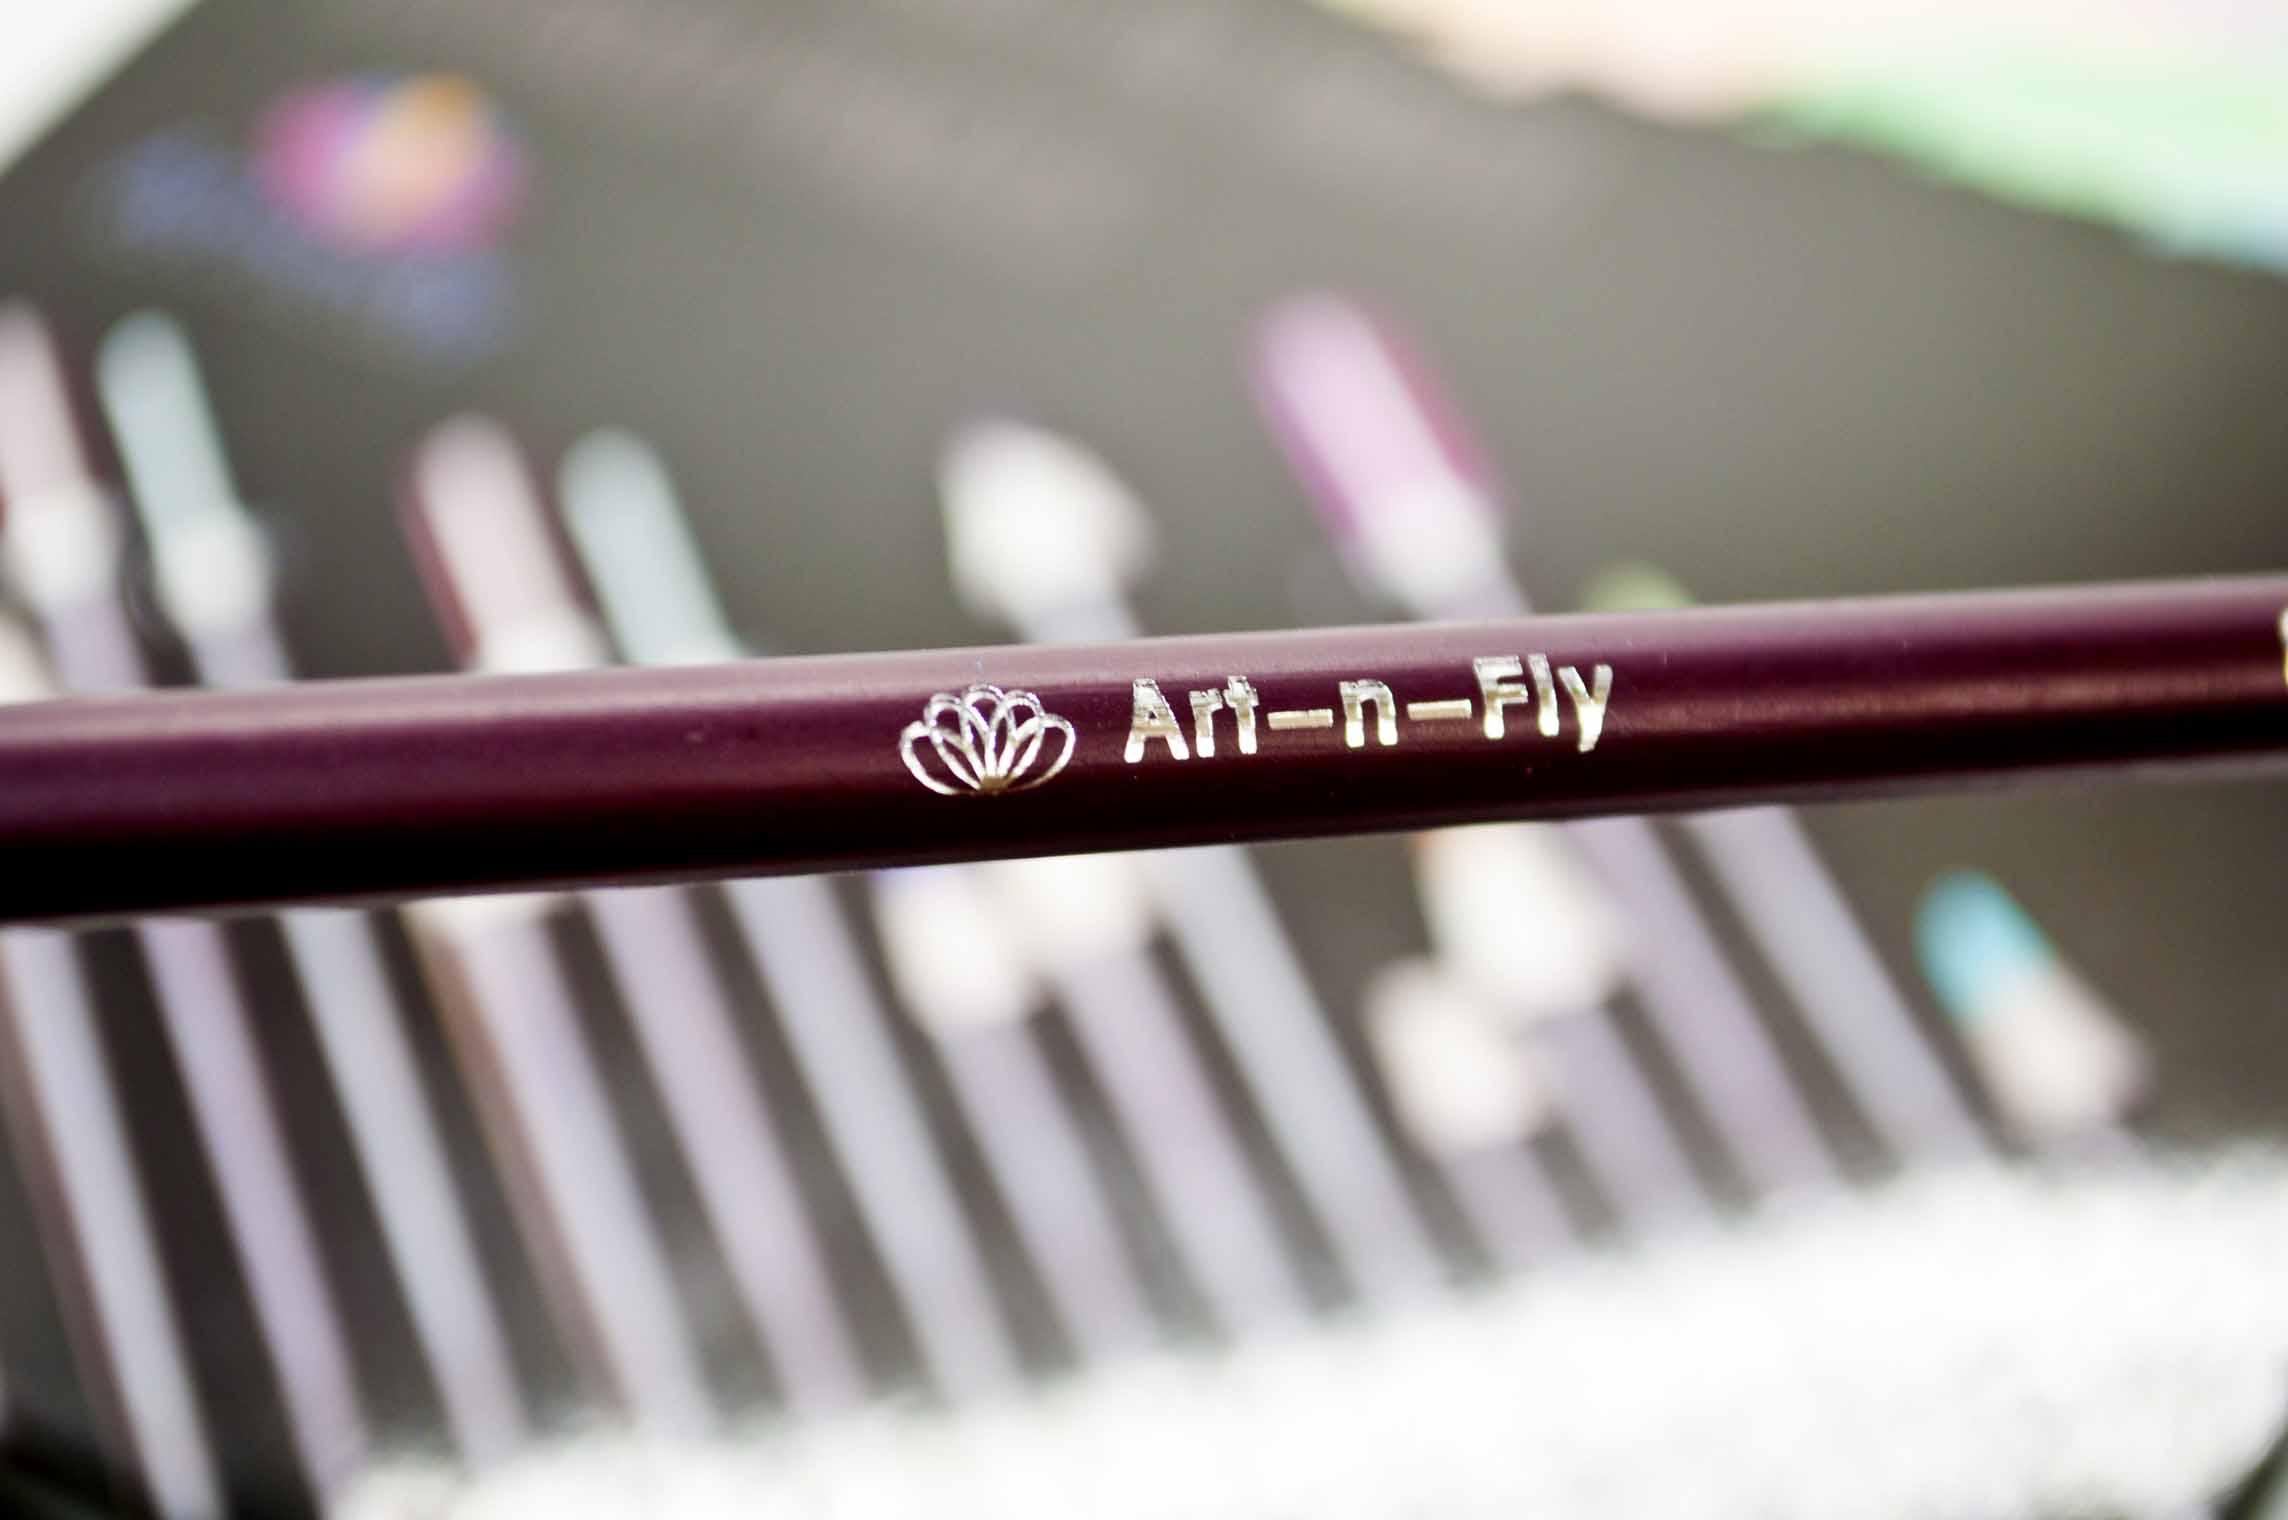 art-n-fly name on the barrel.jpg